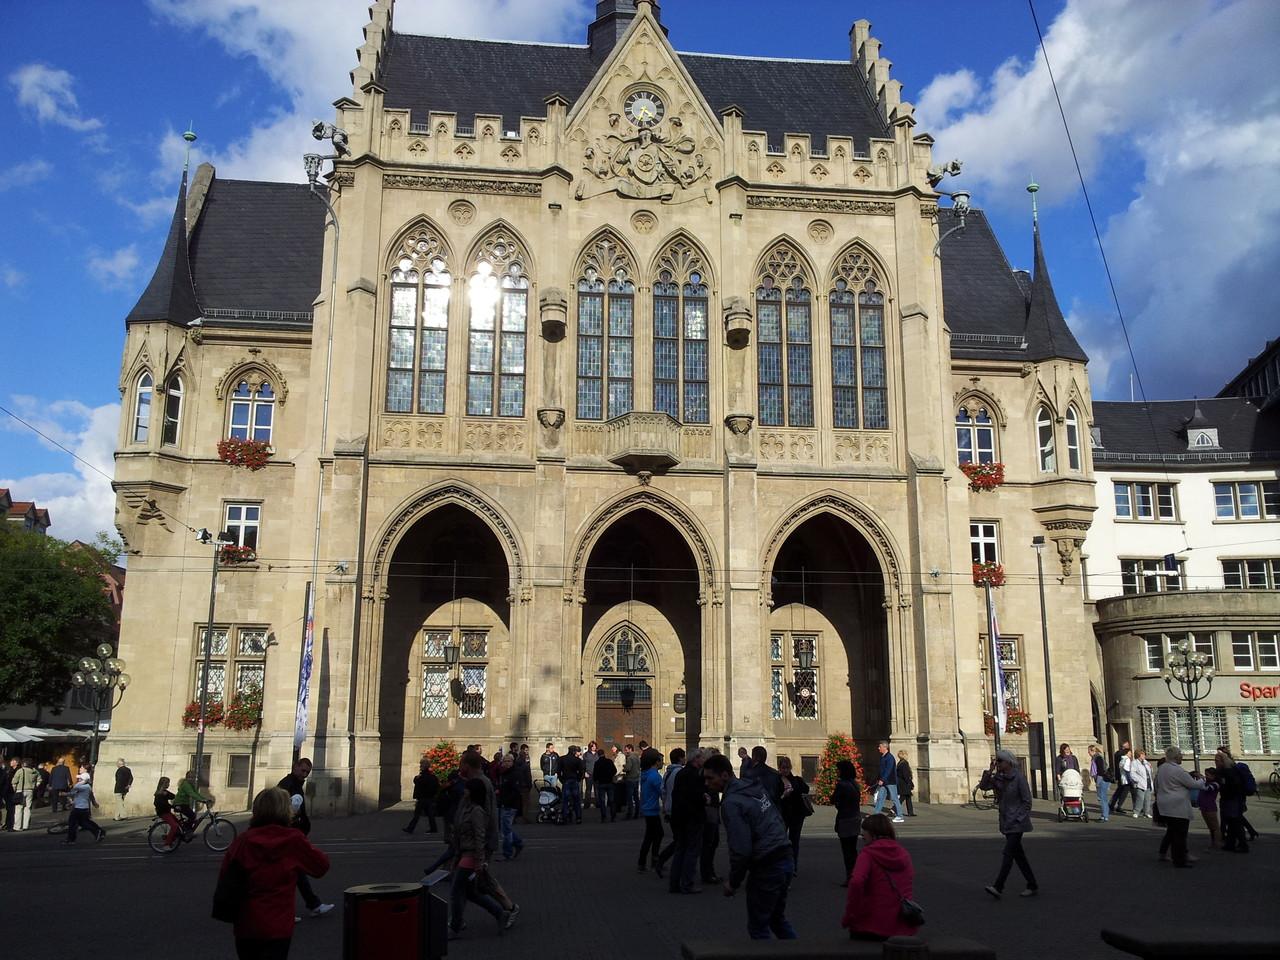 19 BilderBlicke - Stadt Erfurt